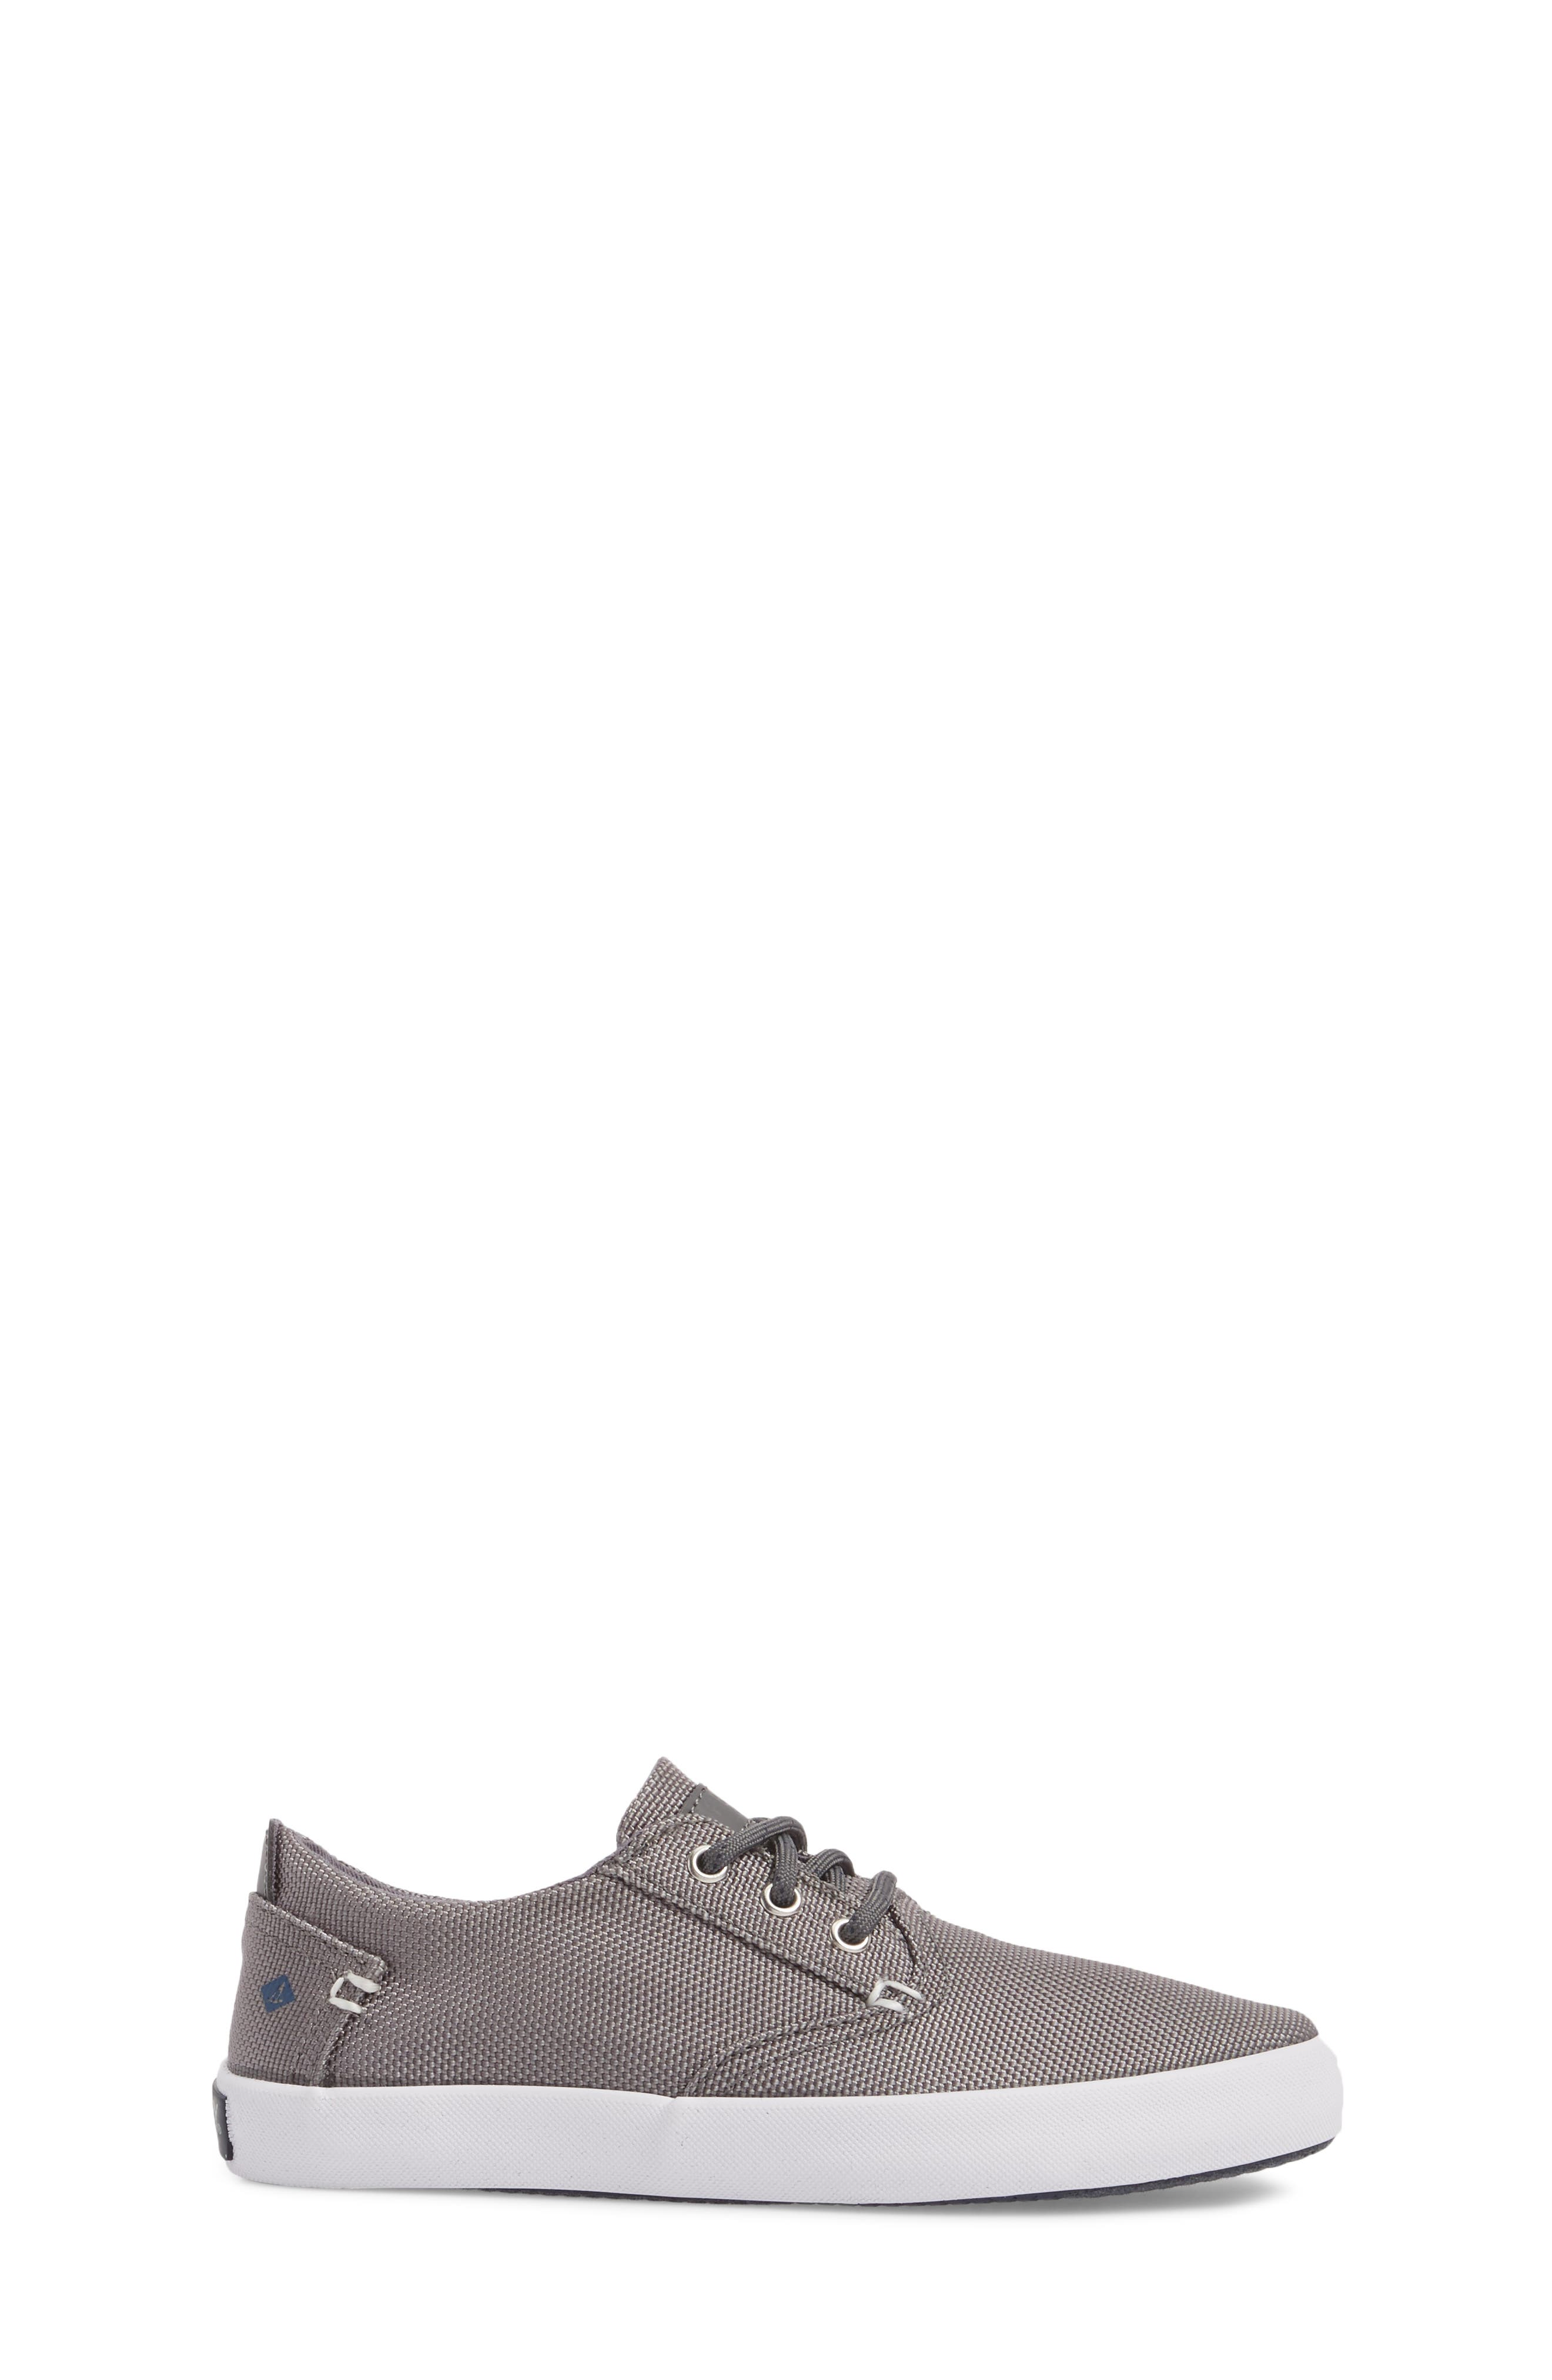 Bodie Sneaker,                             Alternate thumbnail 3, color,                             GREY